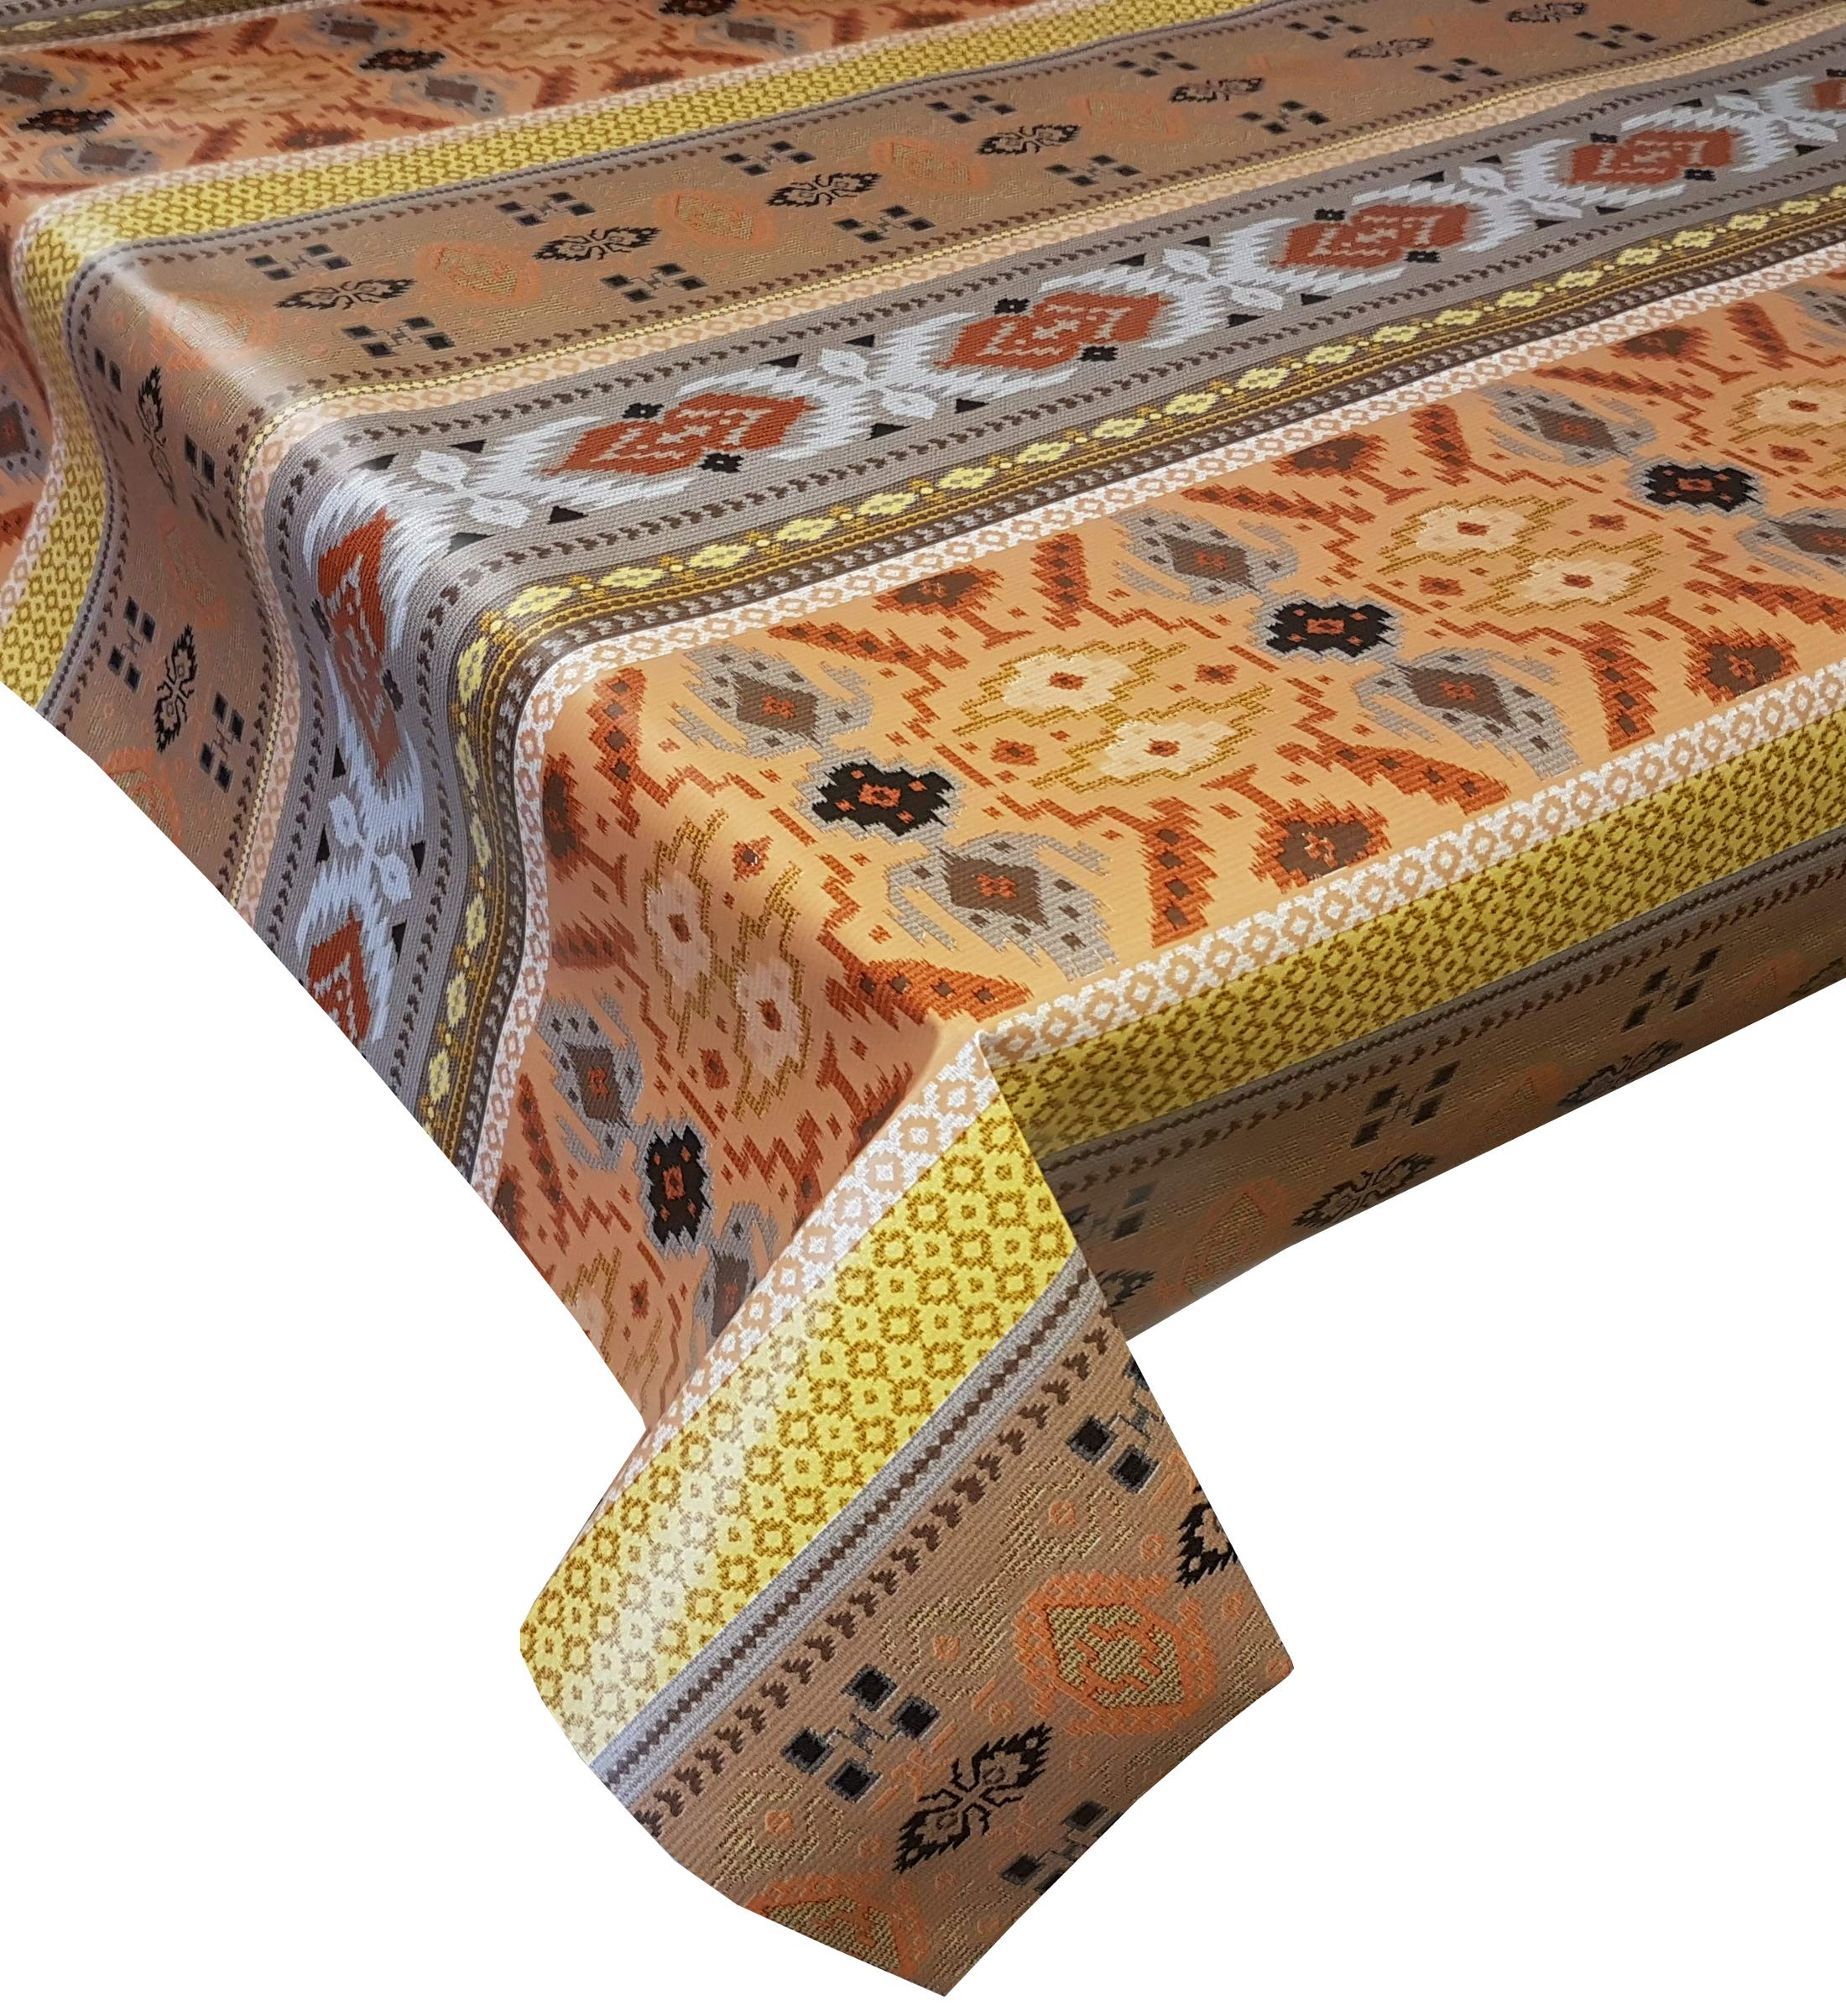 140 x 200cm Oval Wipe Clean PVC Tablecloth Lemons